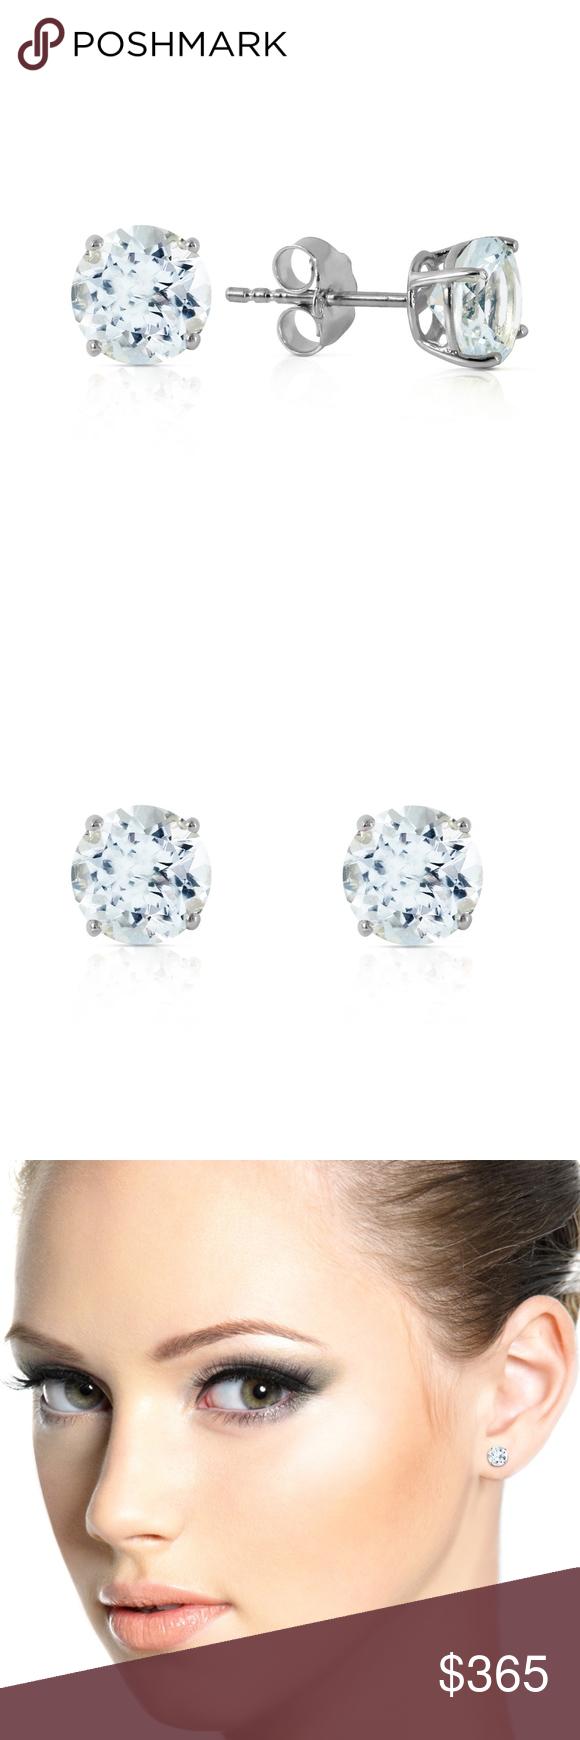 Silver Post Earrings Blue Aquamarine Studs Natural Aquamarine Earrings Stud Earrings